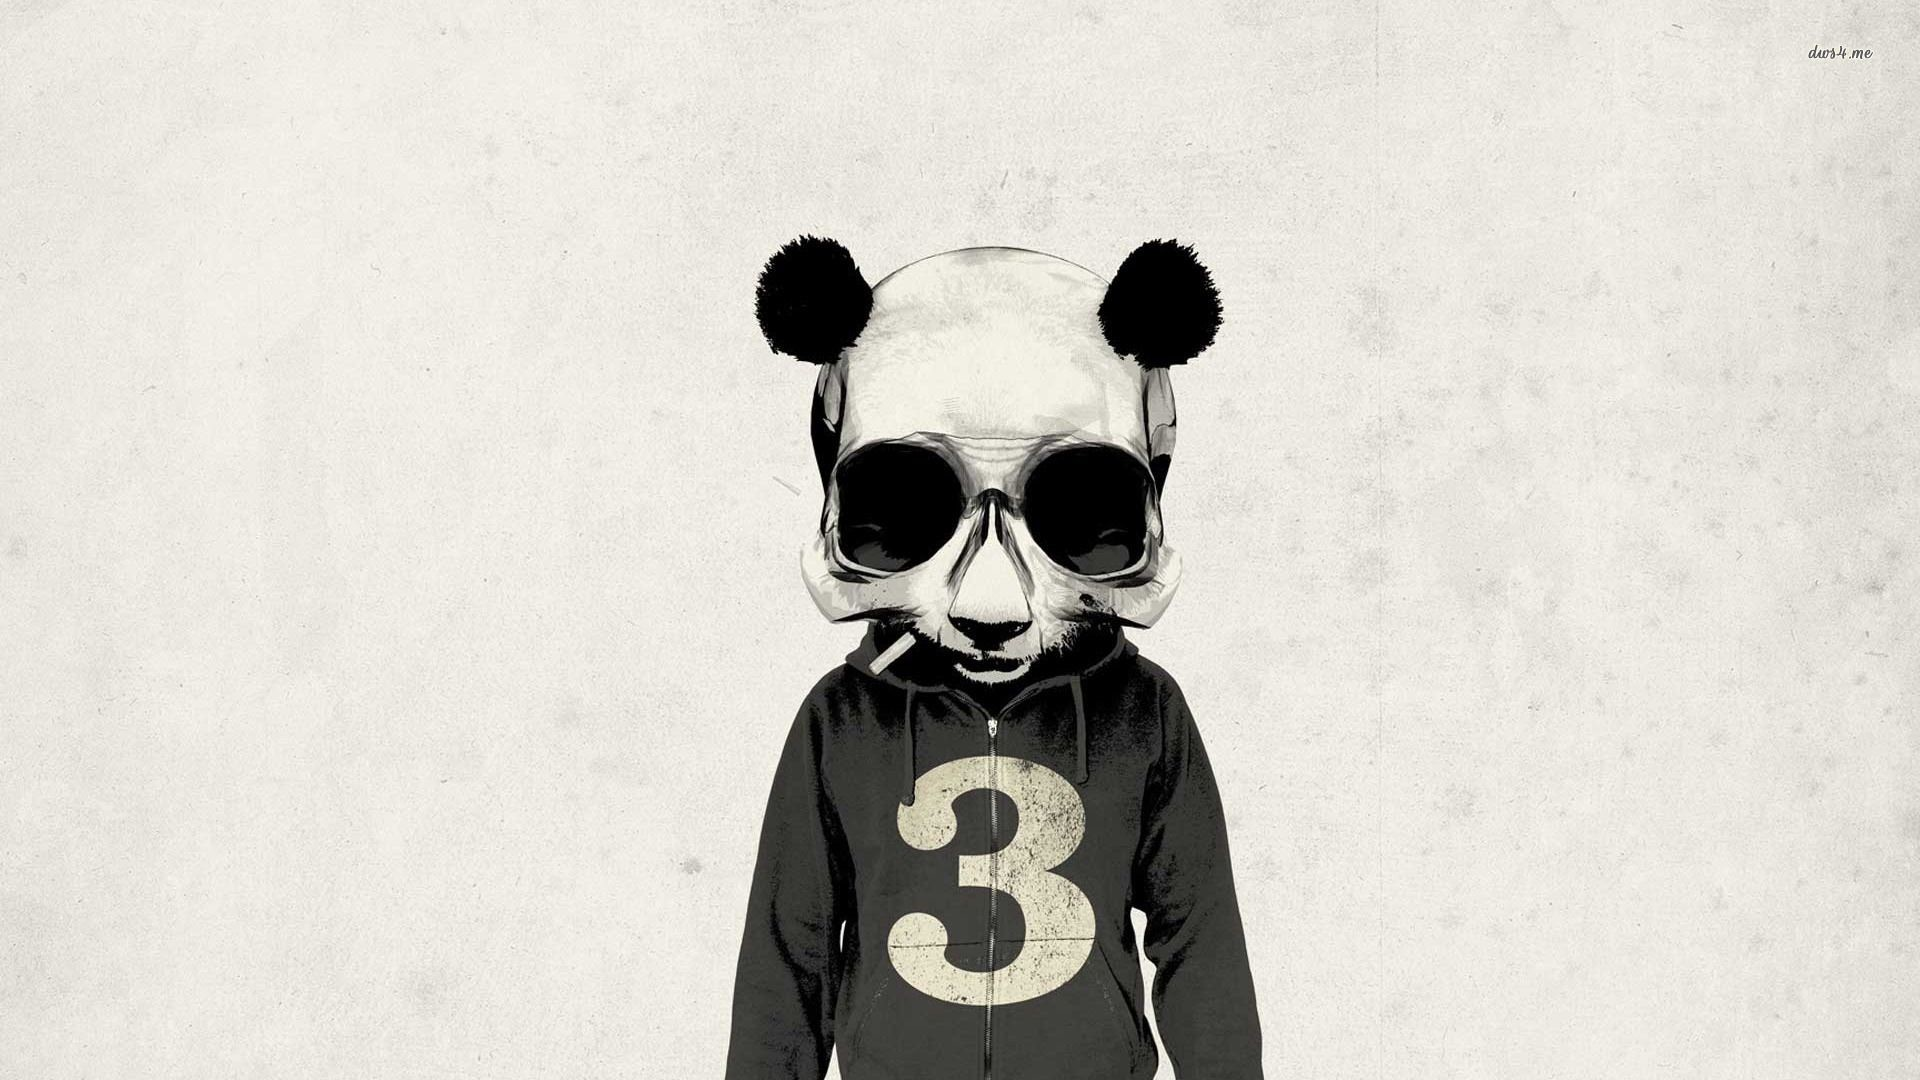 Panda skull wallpaper – Digital Art wallpapers – #11562